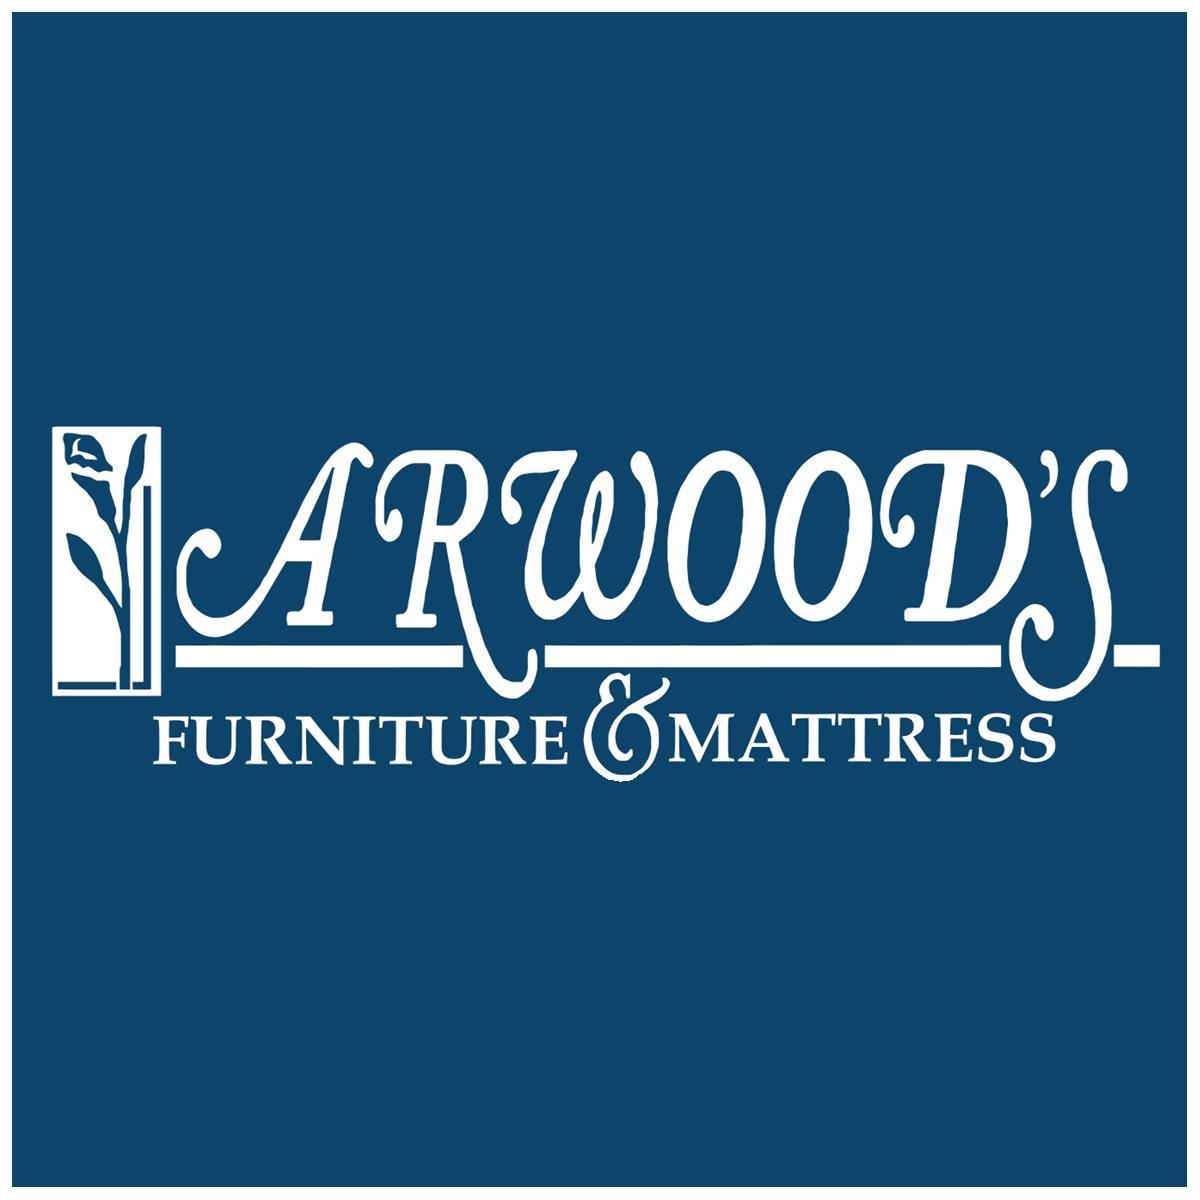 Arwood S Furniture Amp Mattress In Warrensburg Mo 660 429 2